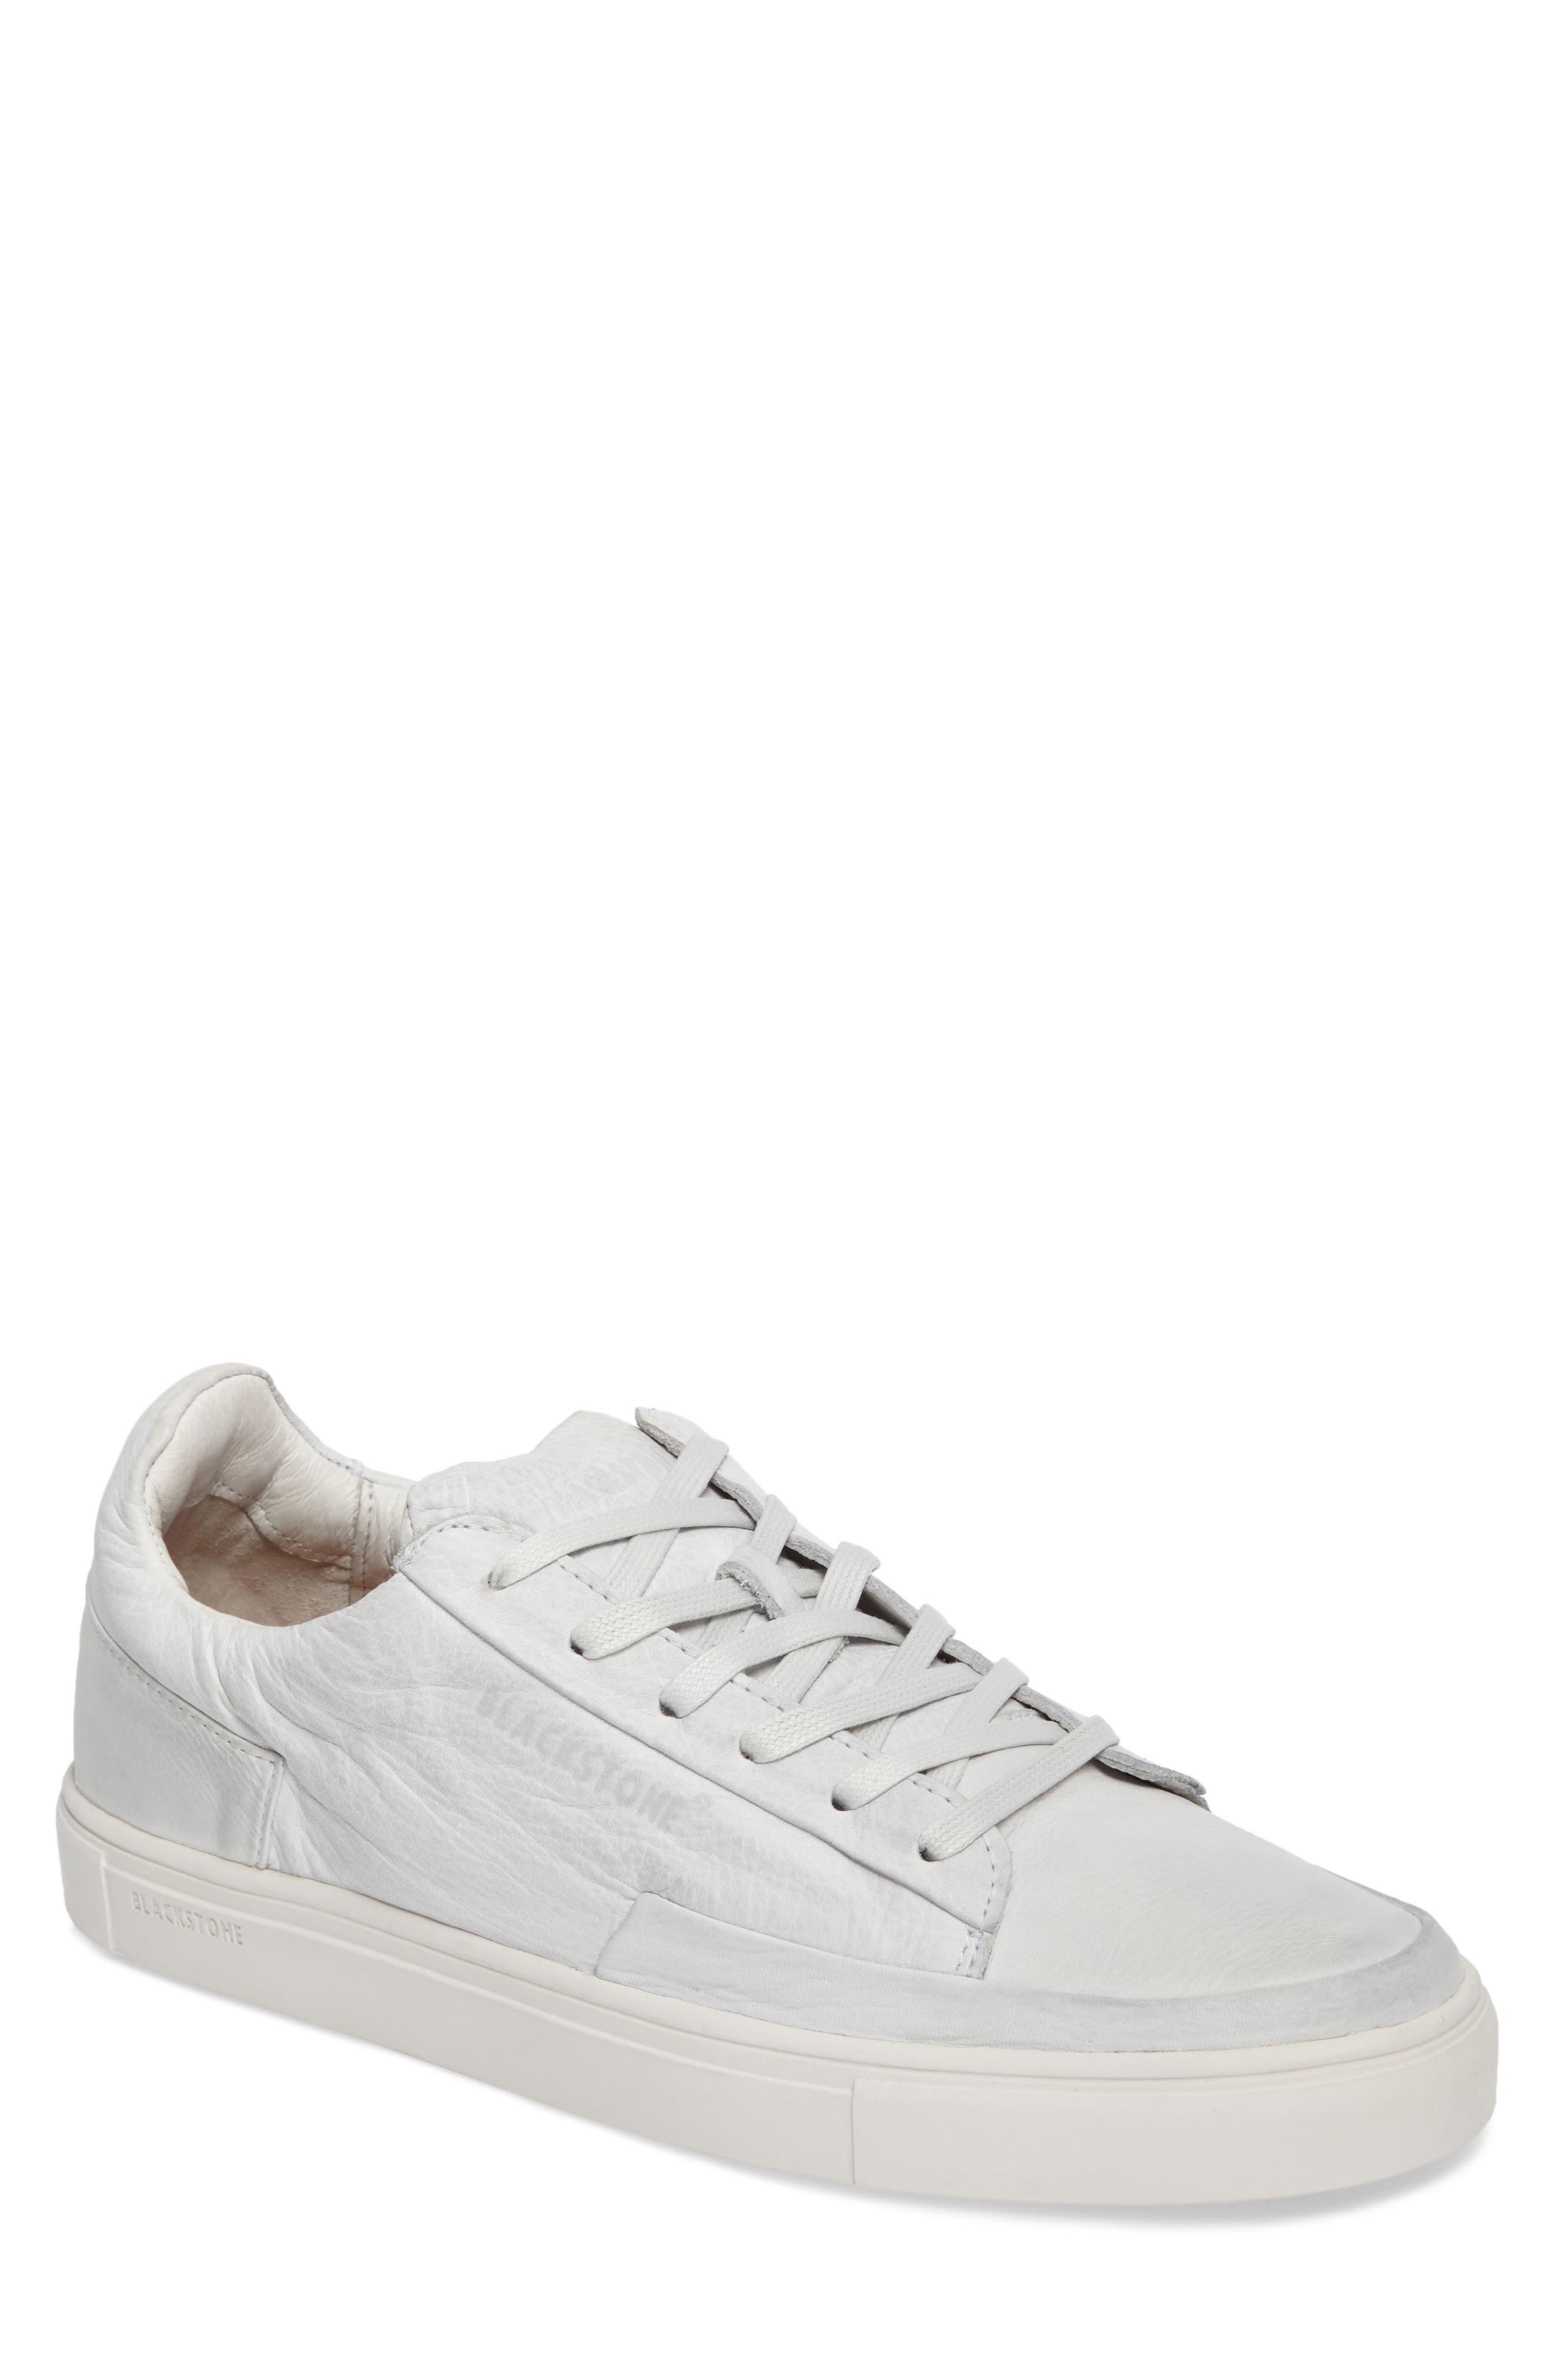 'KM01' Sneaker,                         Main,                         color, 100